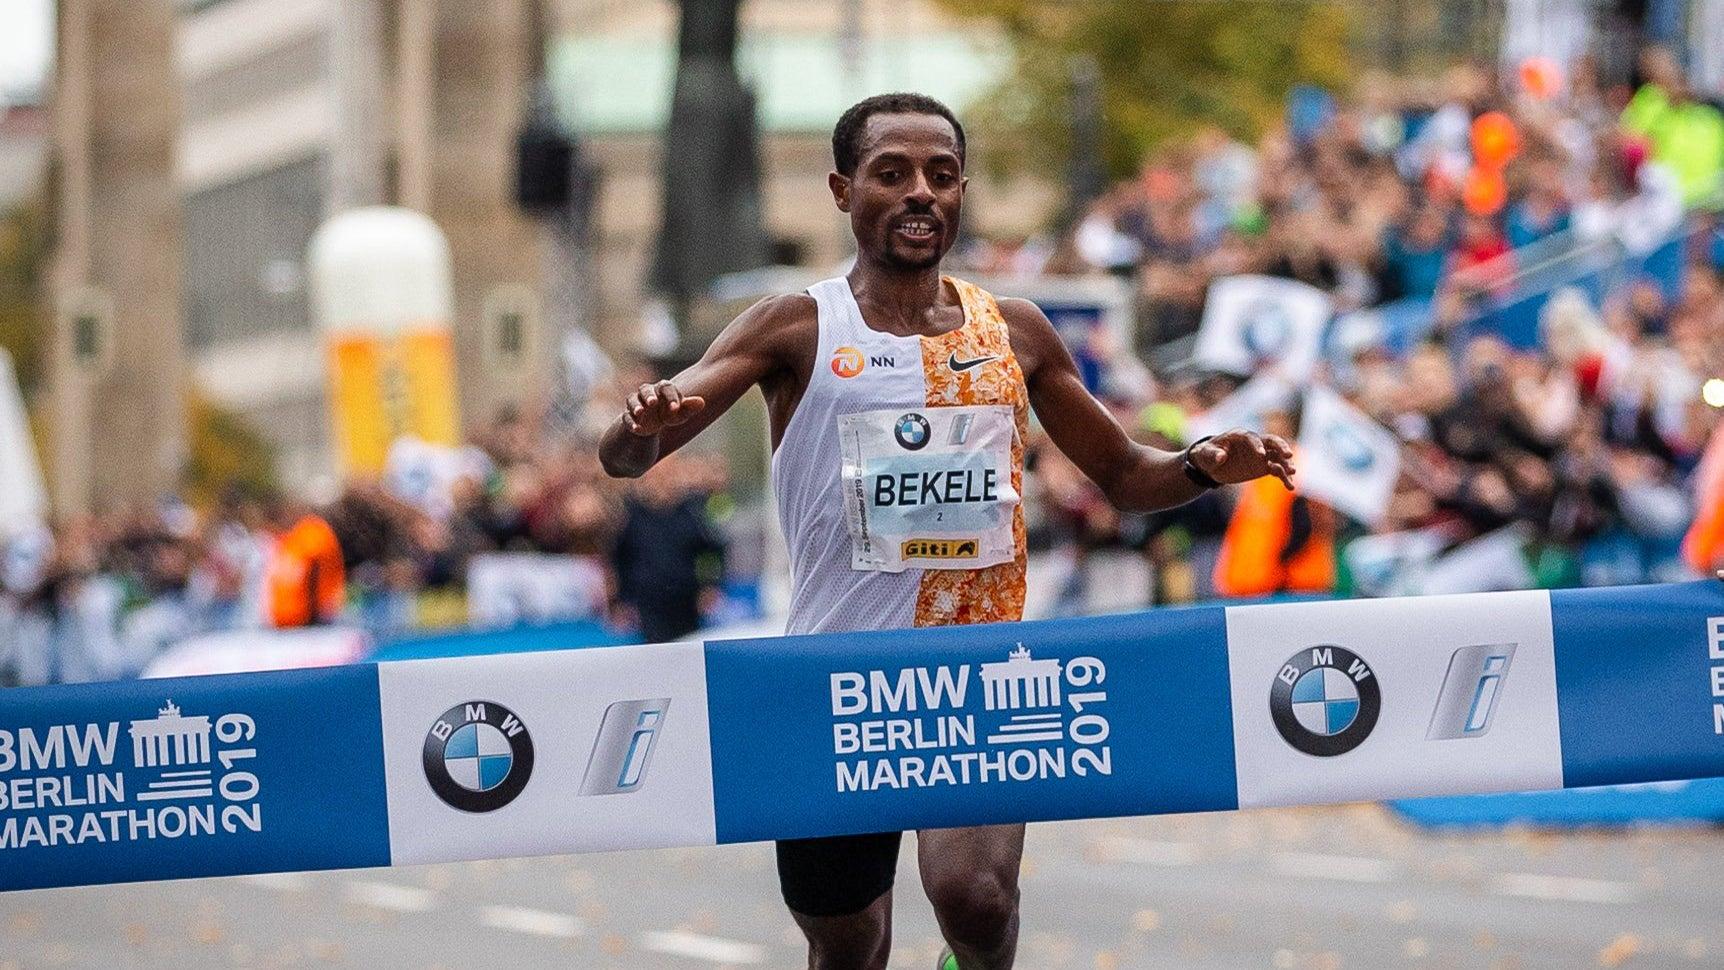 Bekele_Kenenisa_Berlin_29-Sep-2019_Winning_Courtesy_NN_Running_Team